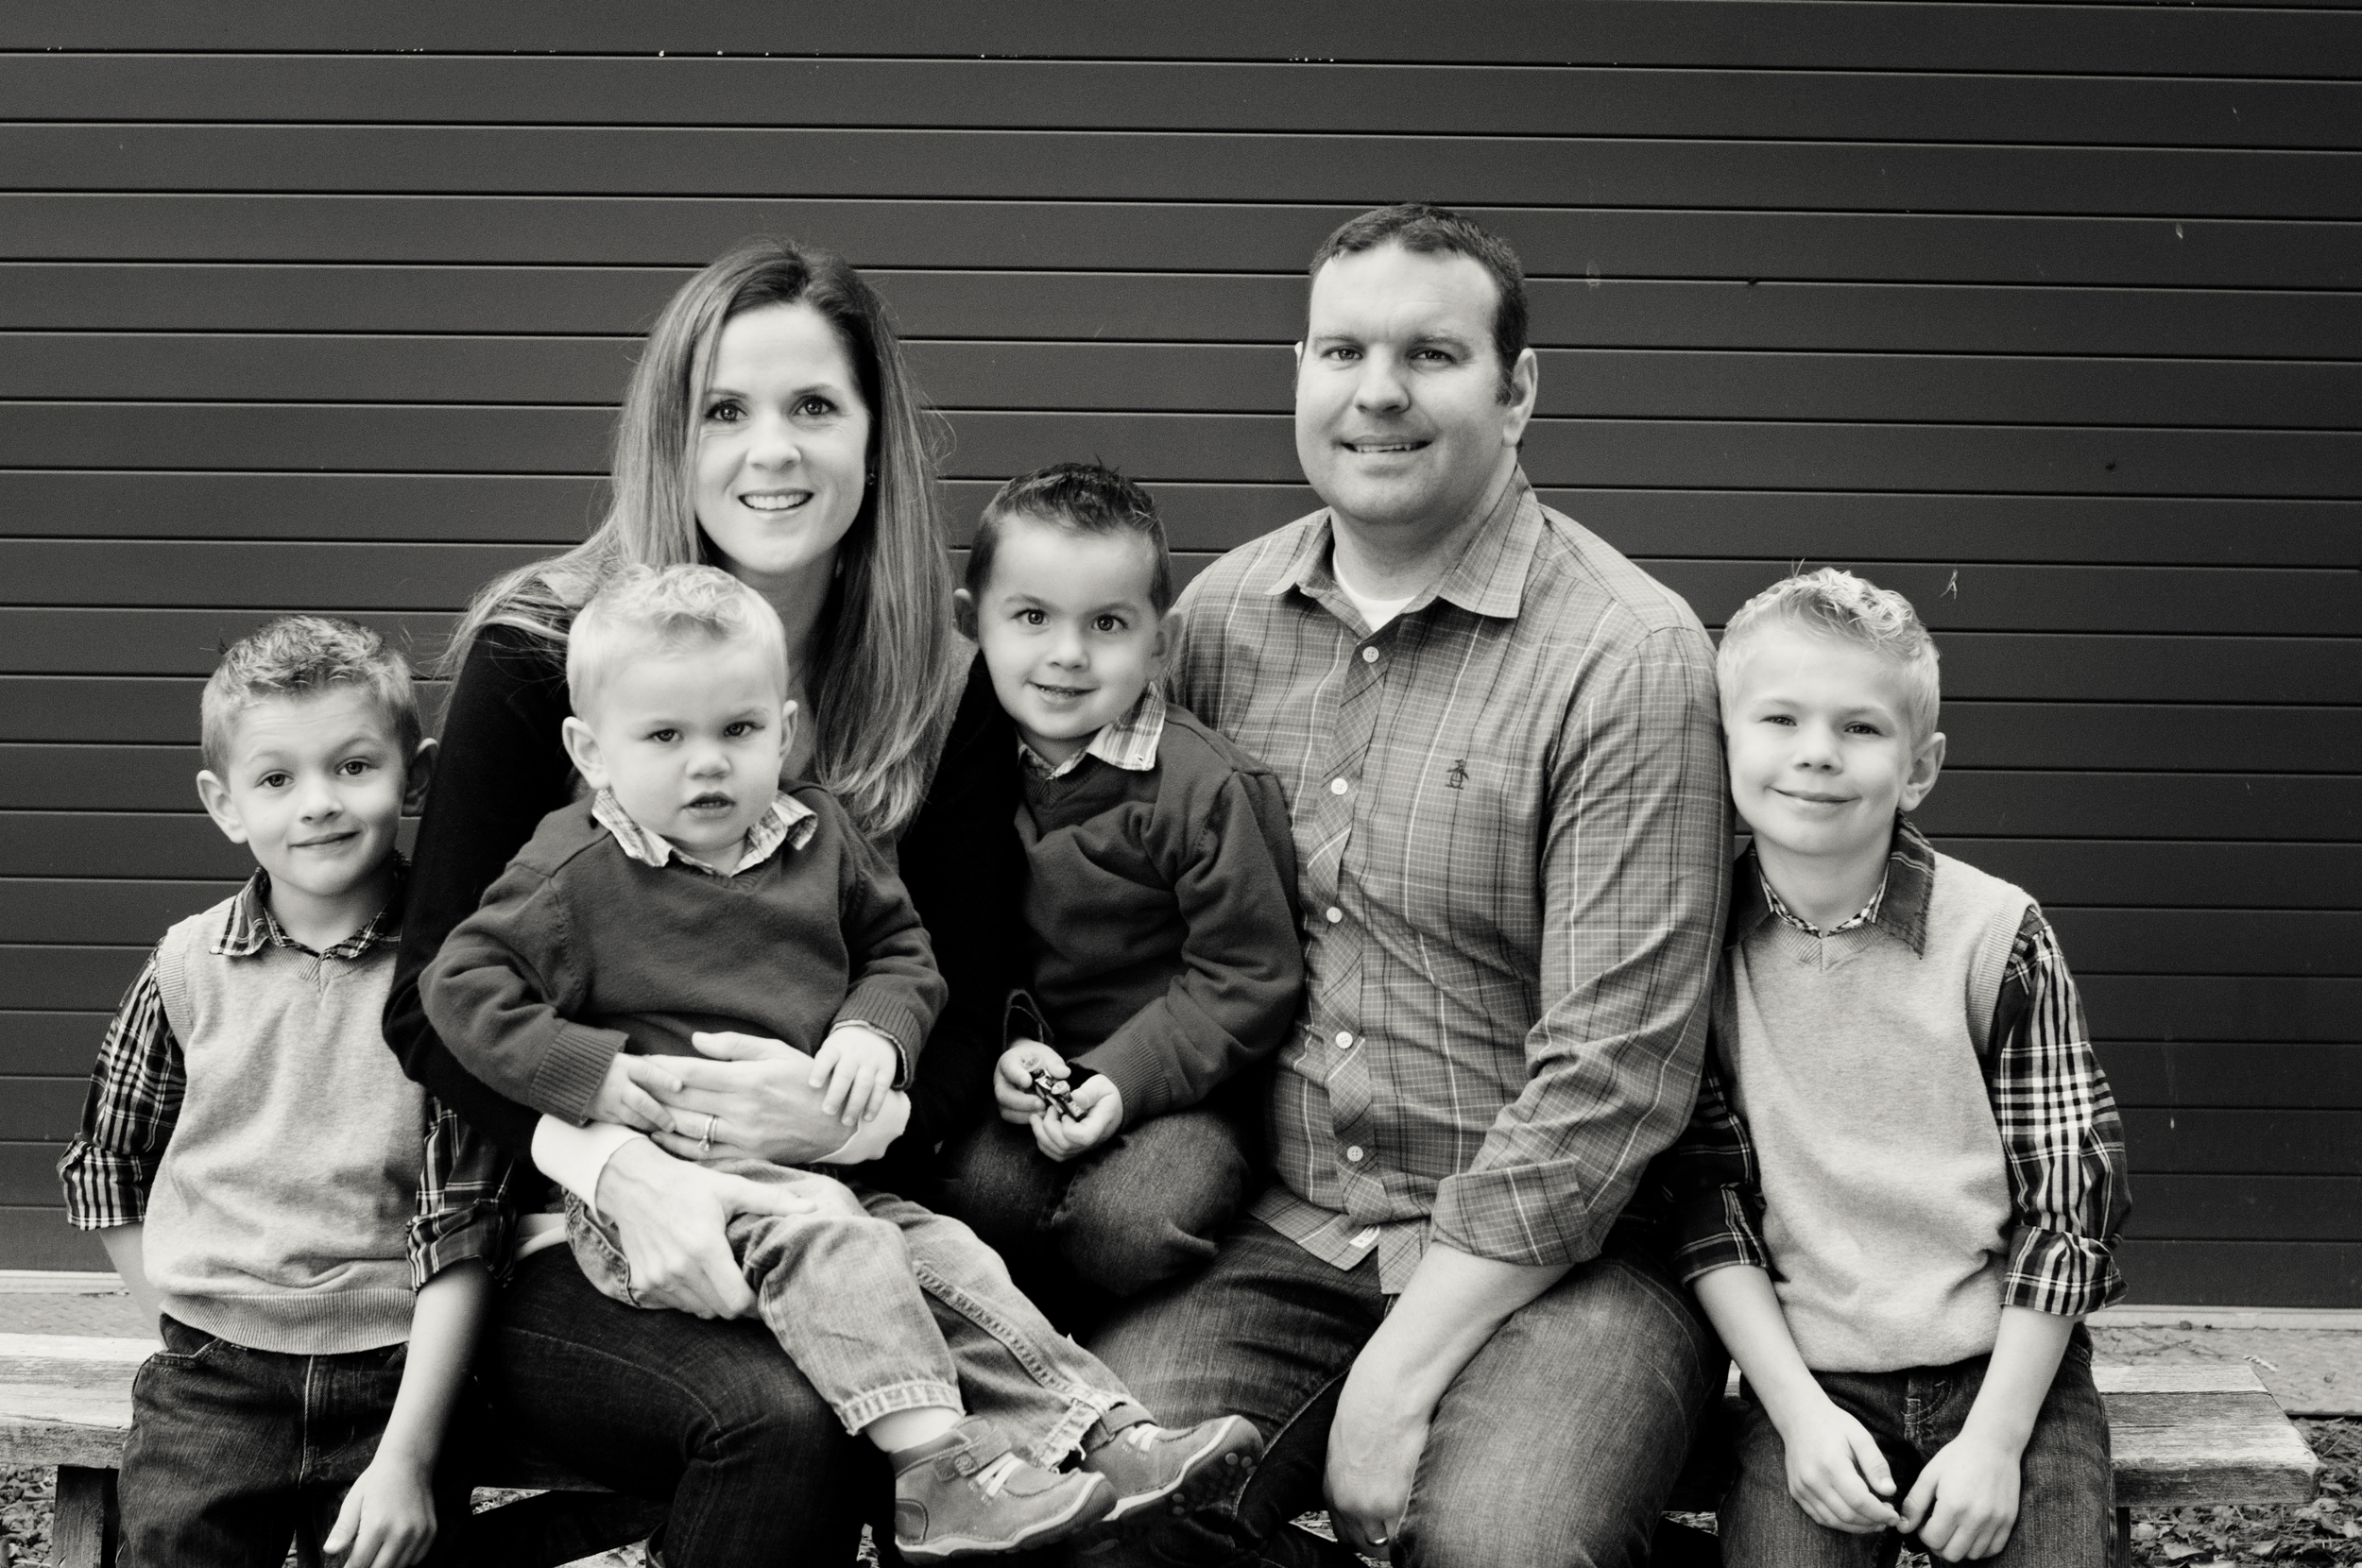 Anderson Family-Family on bench platinum.jpg